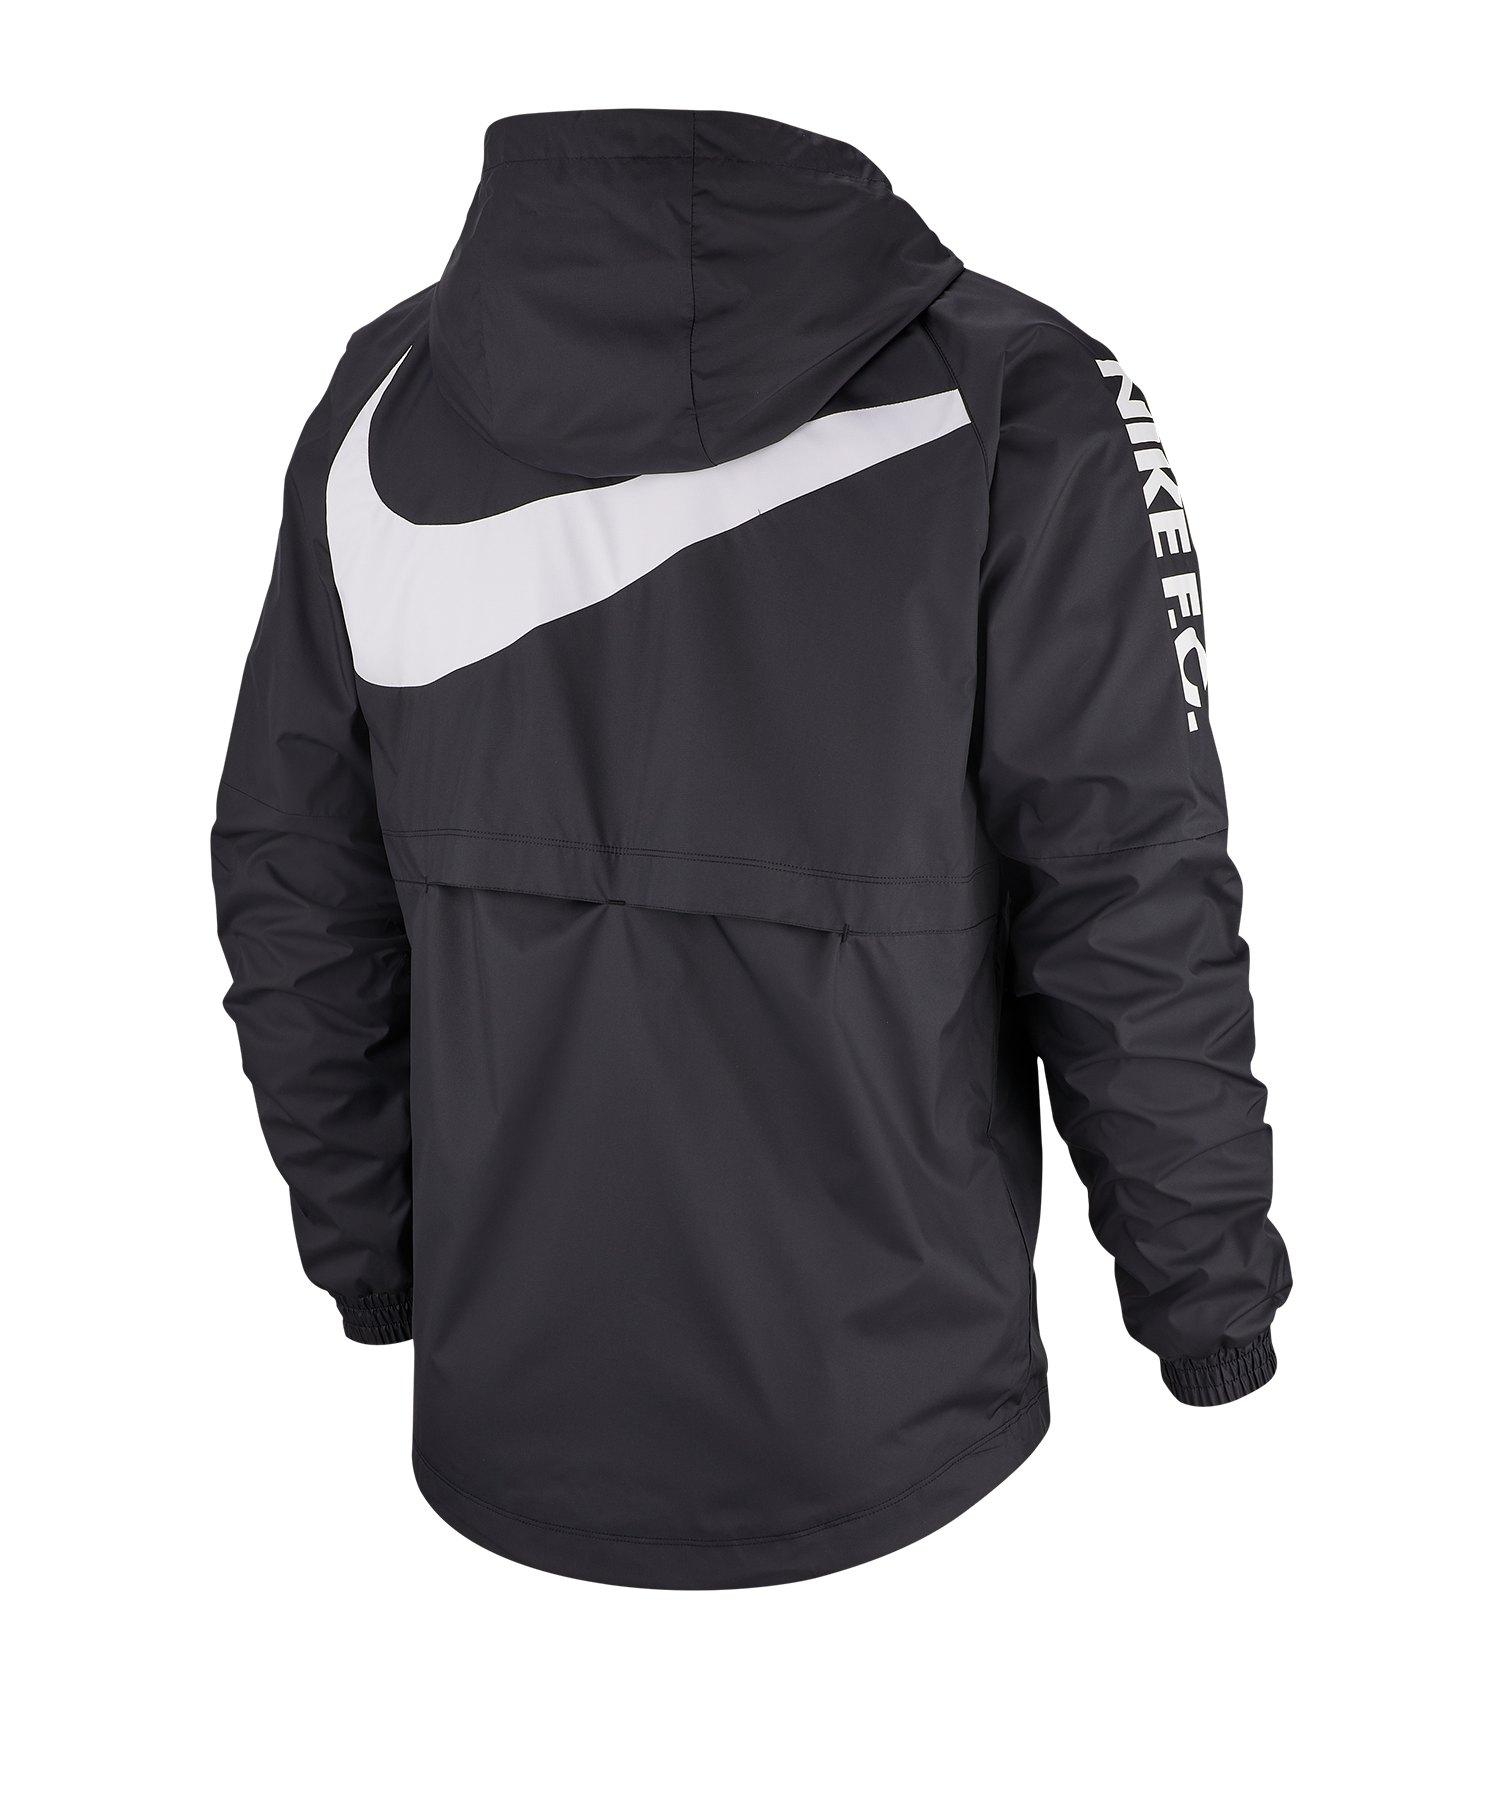 Nike Swoosh Jacke Damen Schwarz F010